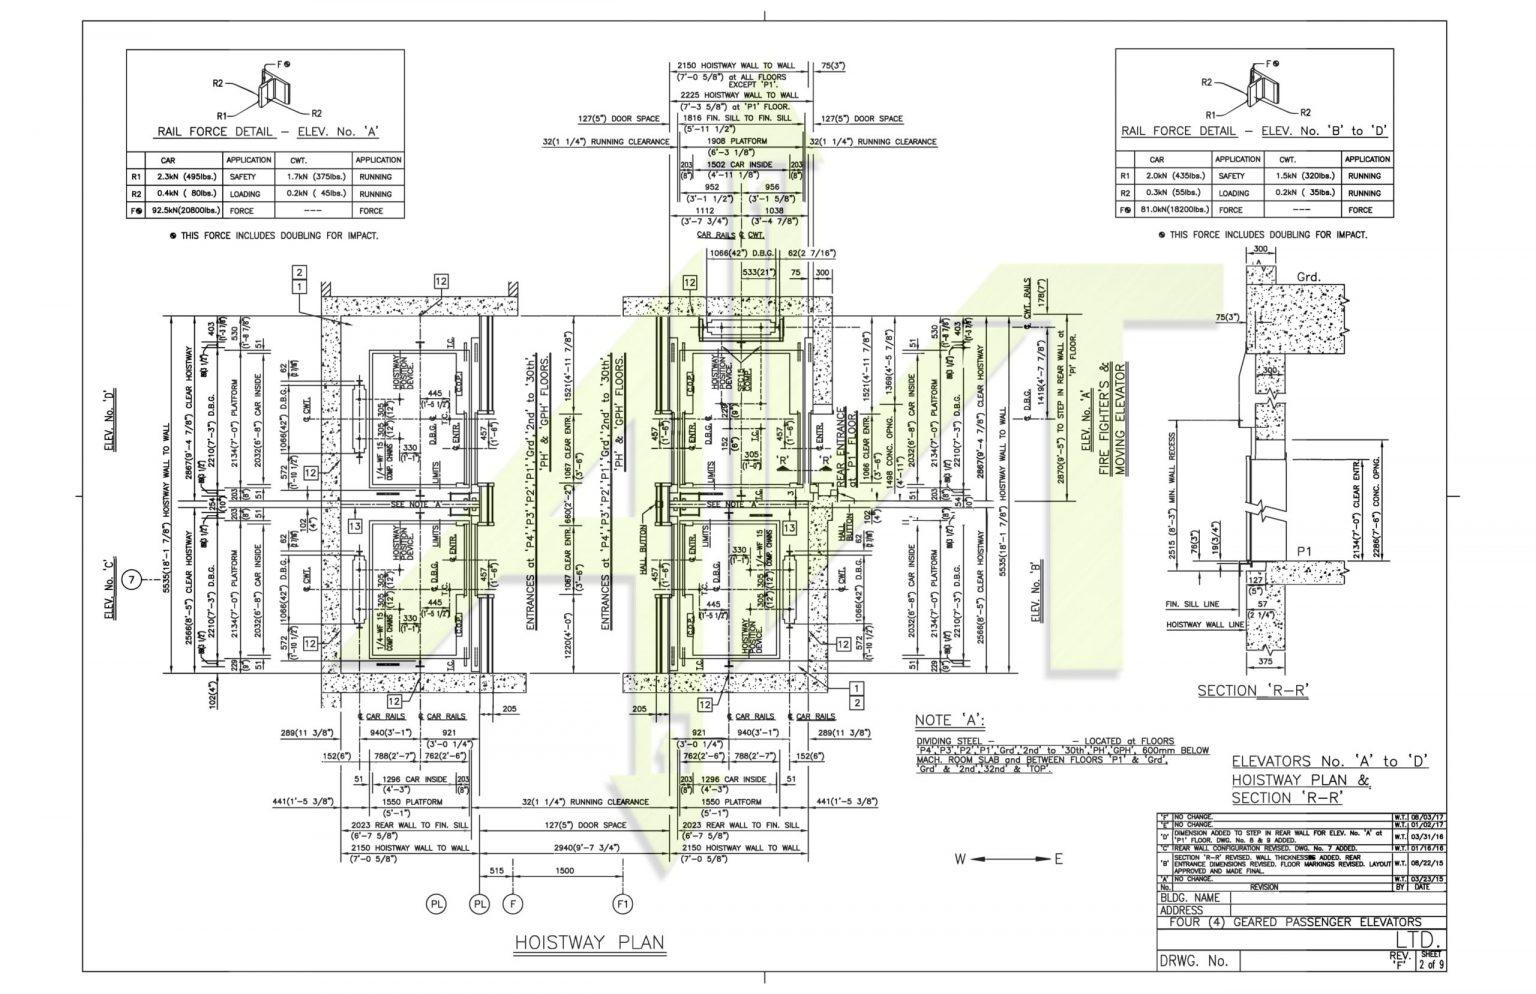 elevator manufacturer and supplier of geared elevators